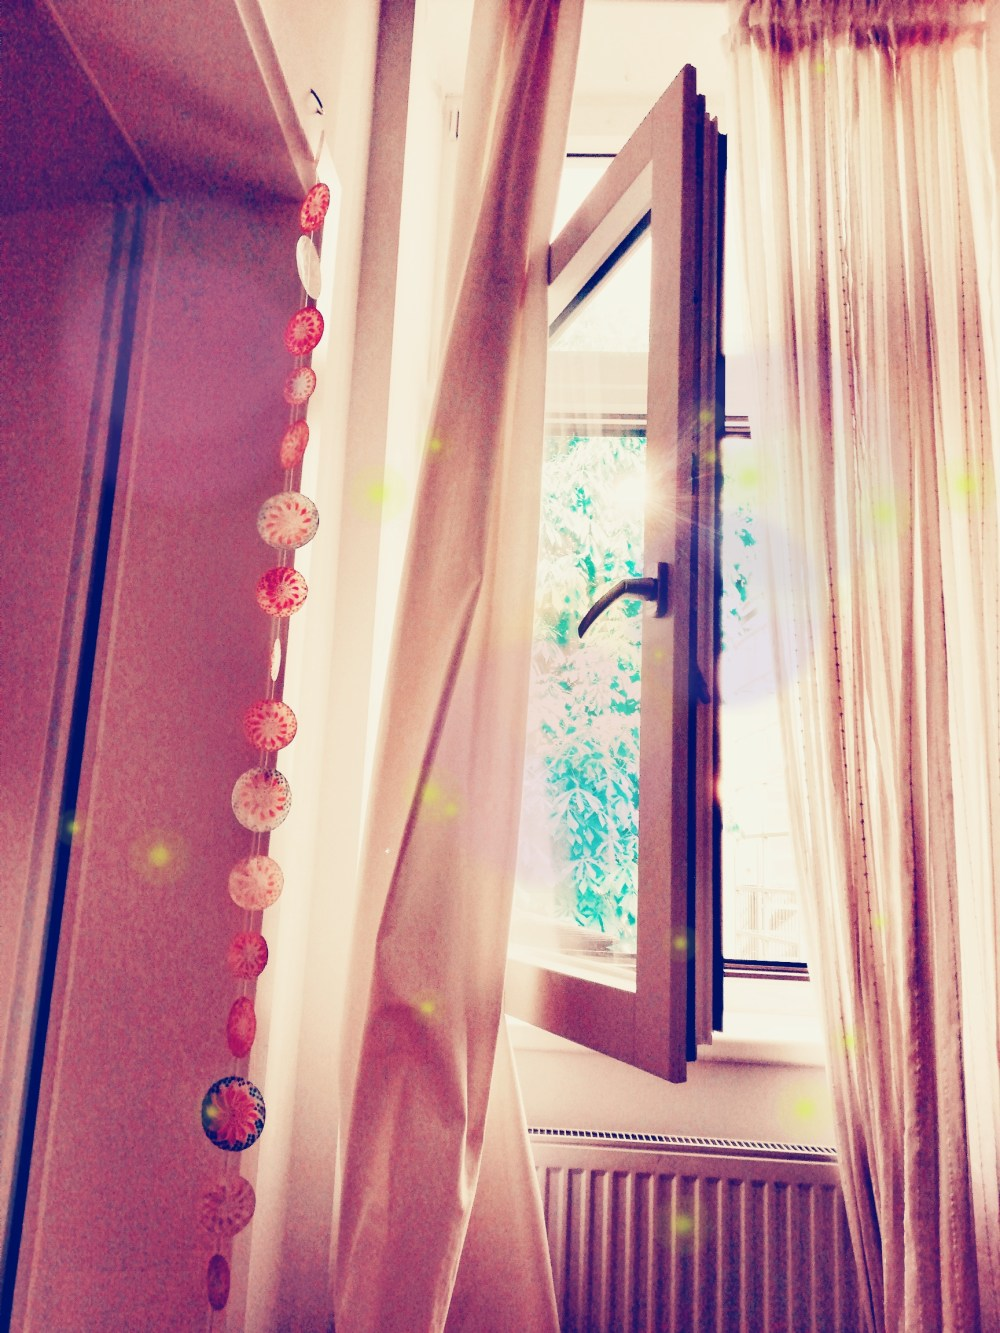 Traumfenster © Silvia Springer